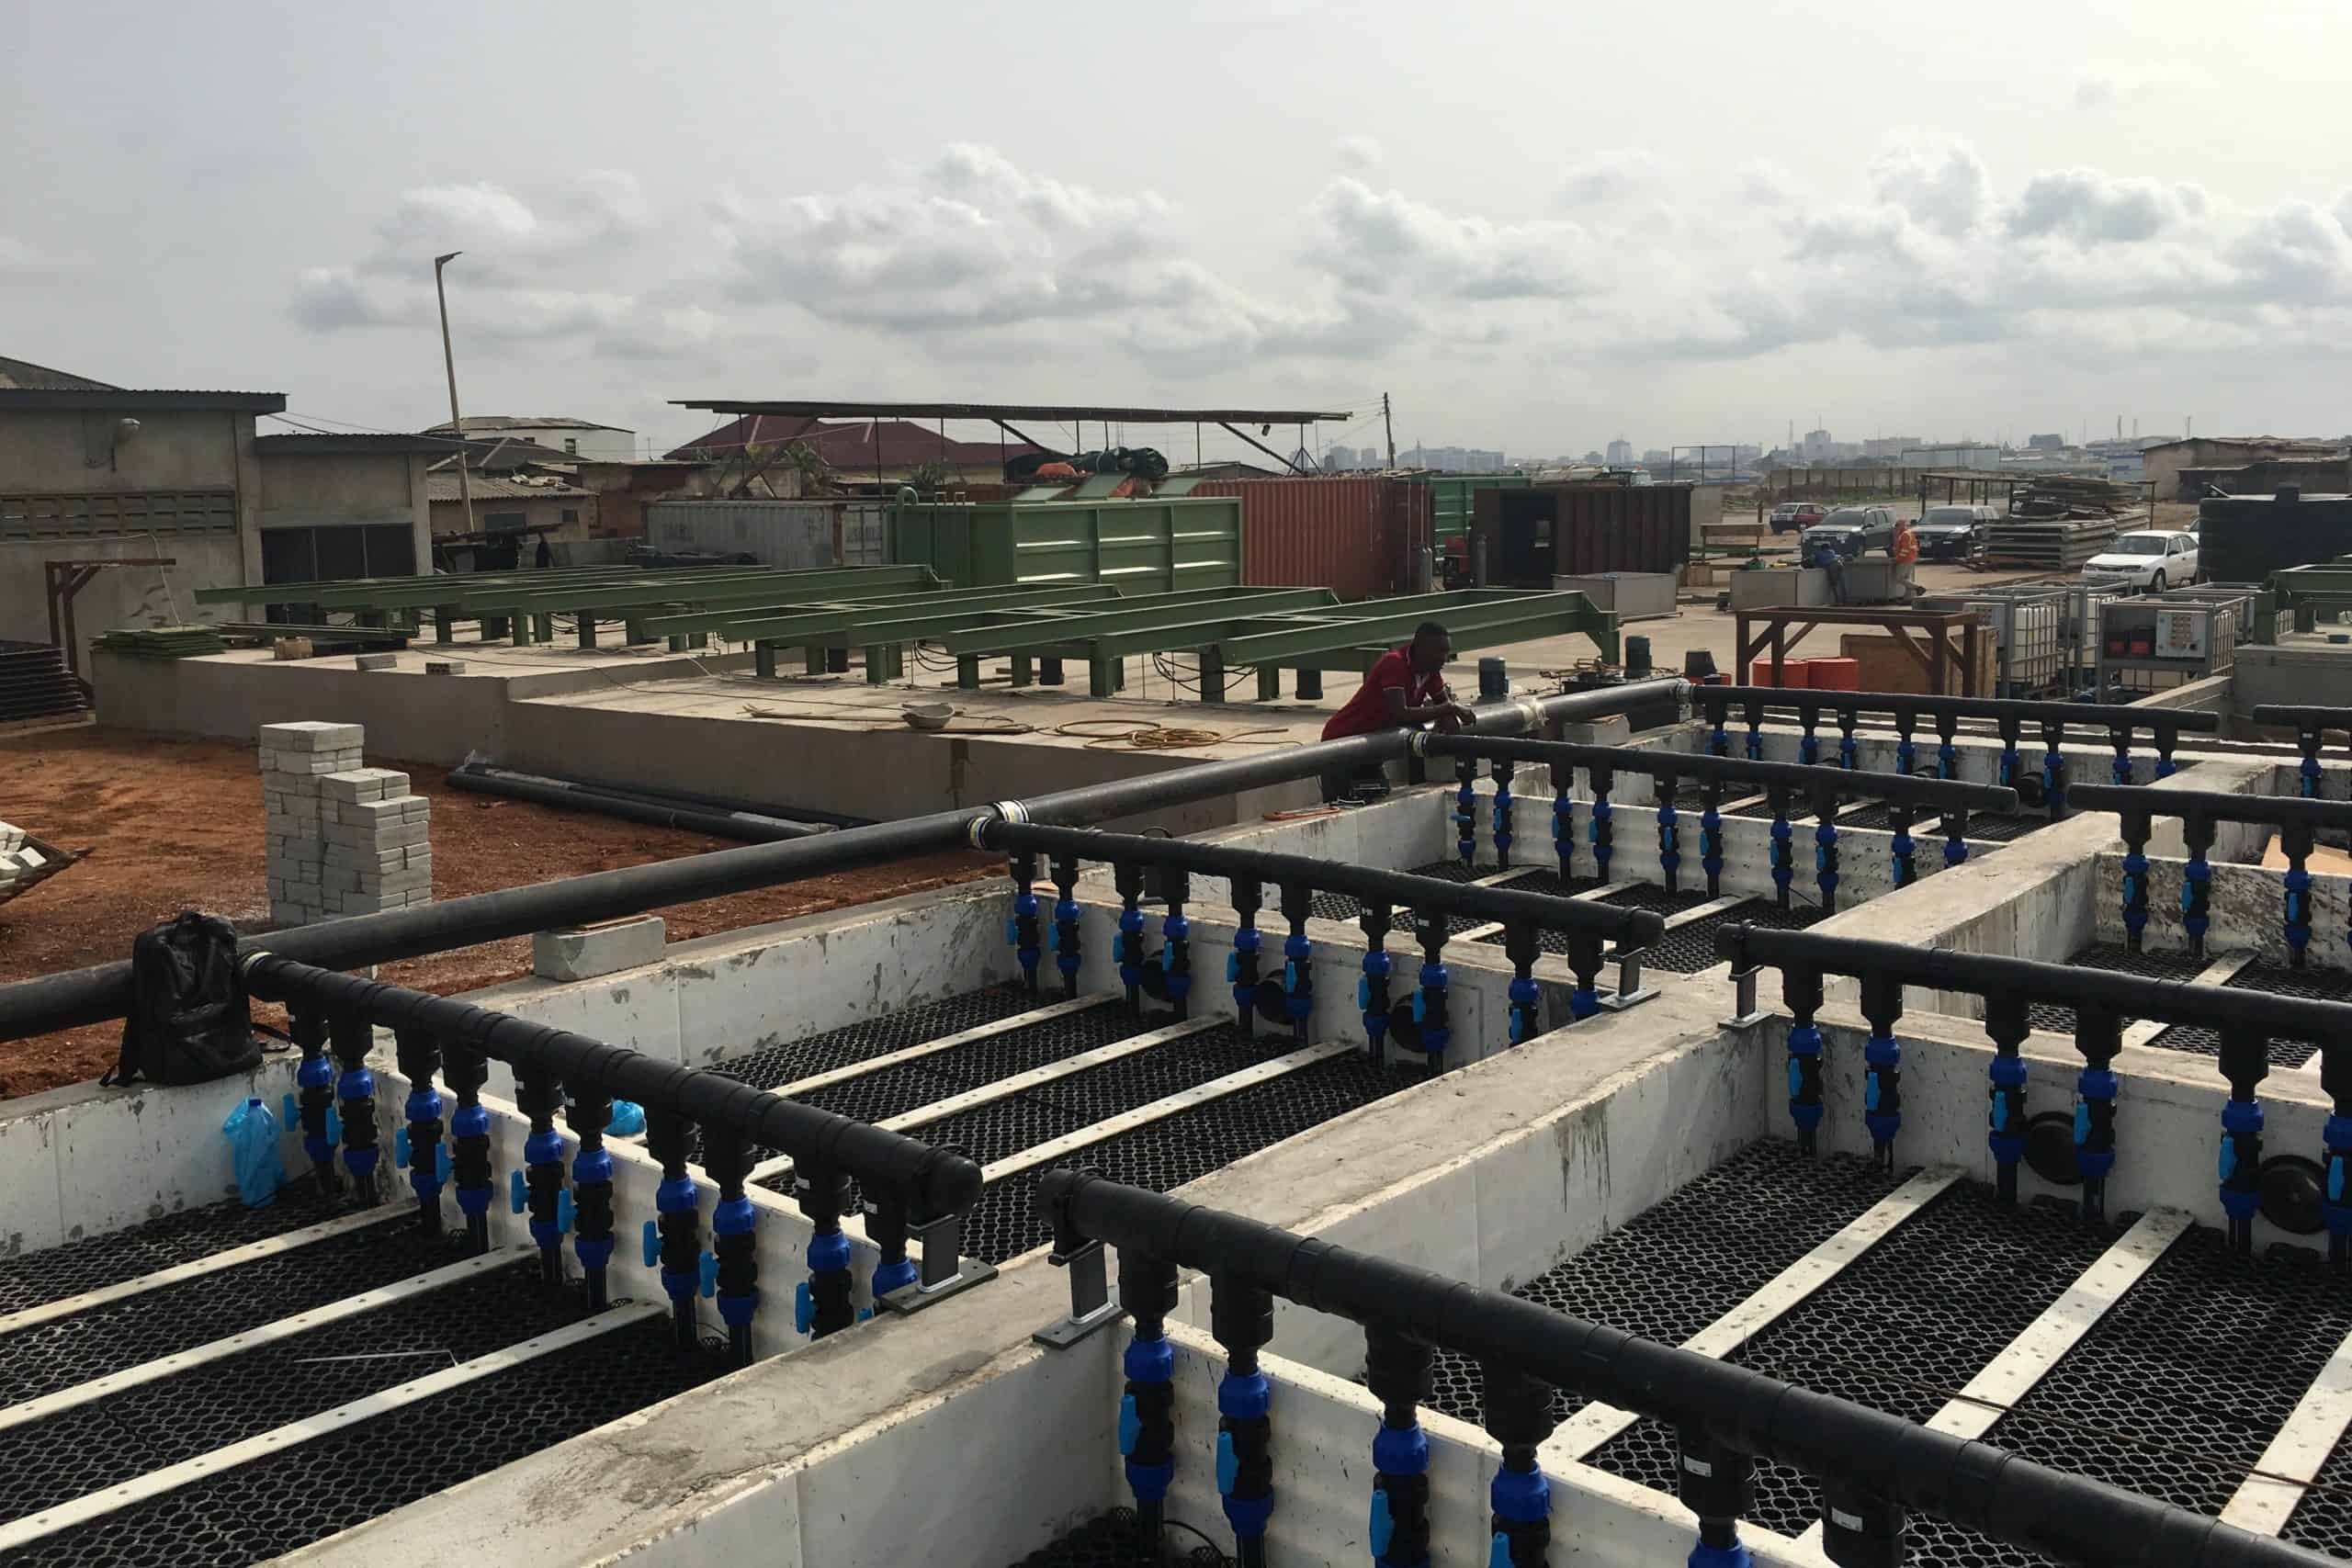 BioKube wastewater system Lavender Hill Ghana - 6